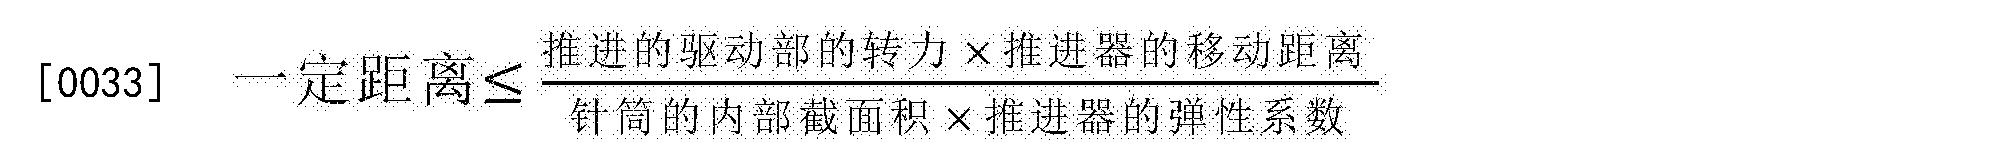 Figure CN105848696AD00051